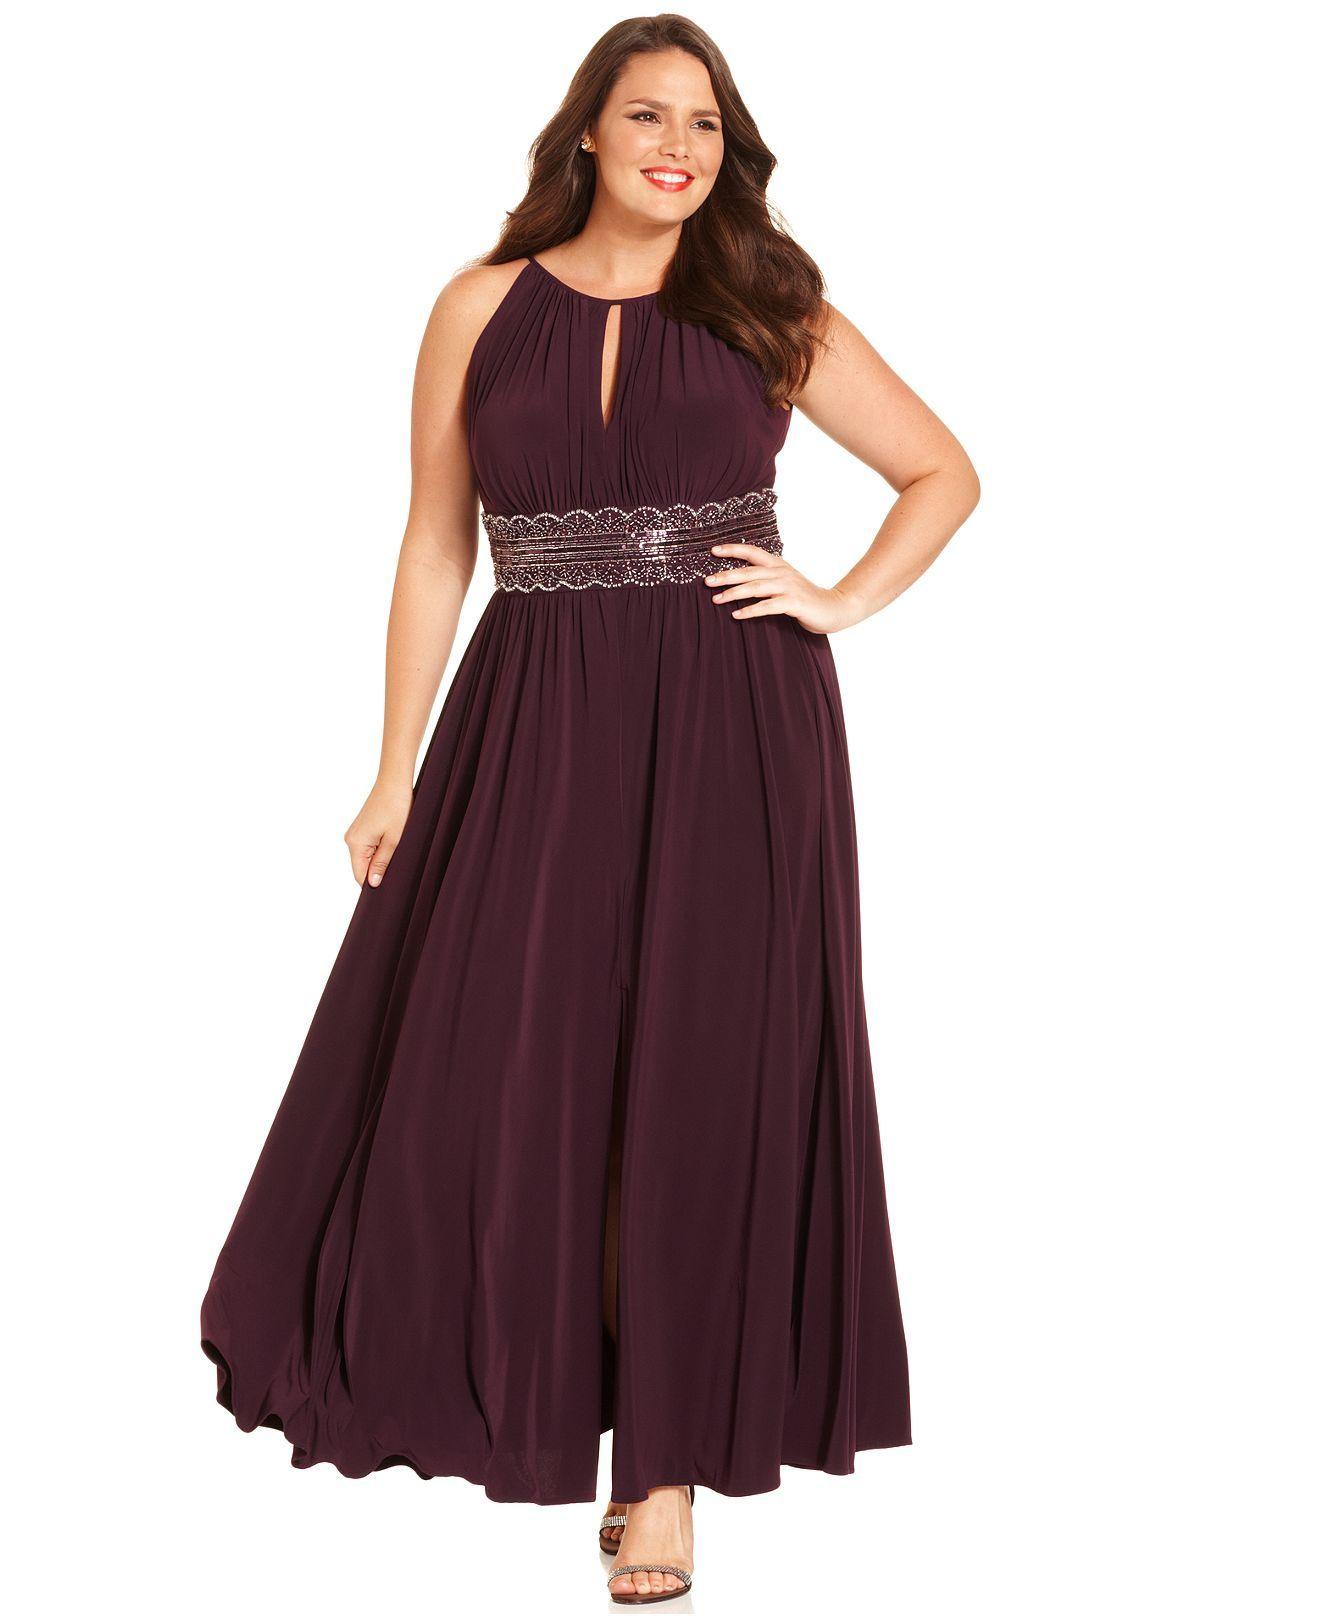 Macys wedding guest dresses plus size - SandiegoTowingca.com